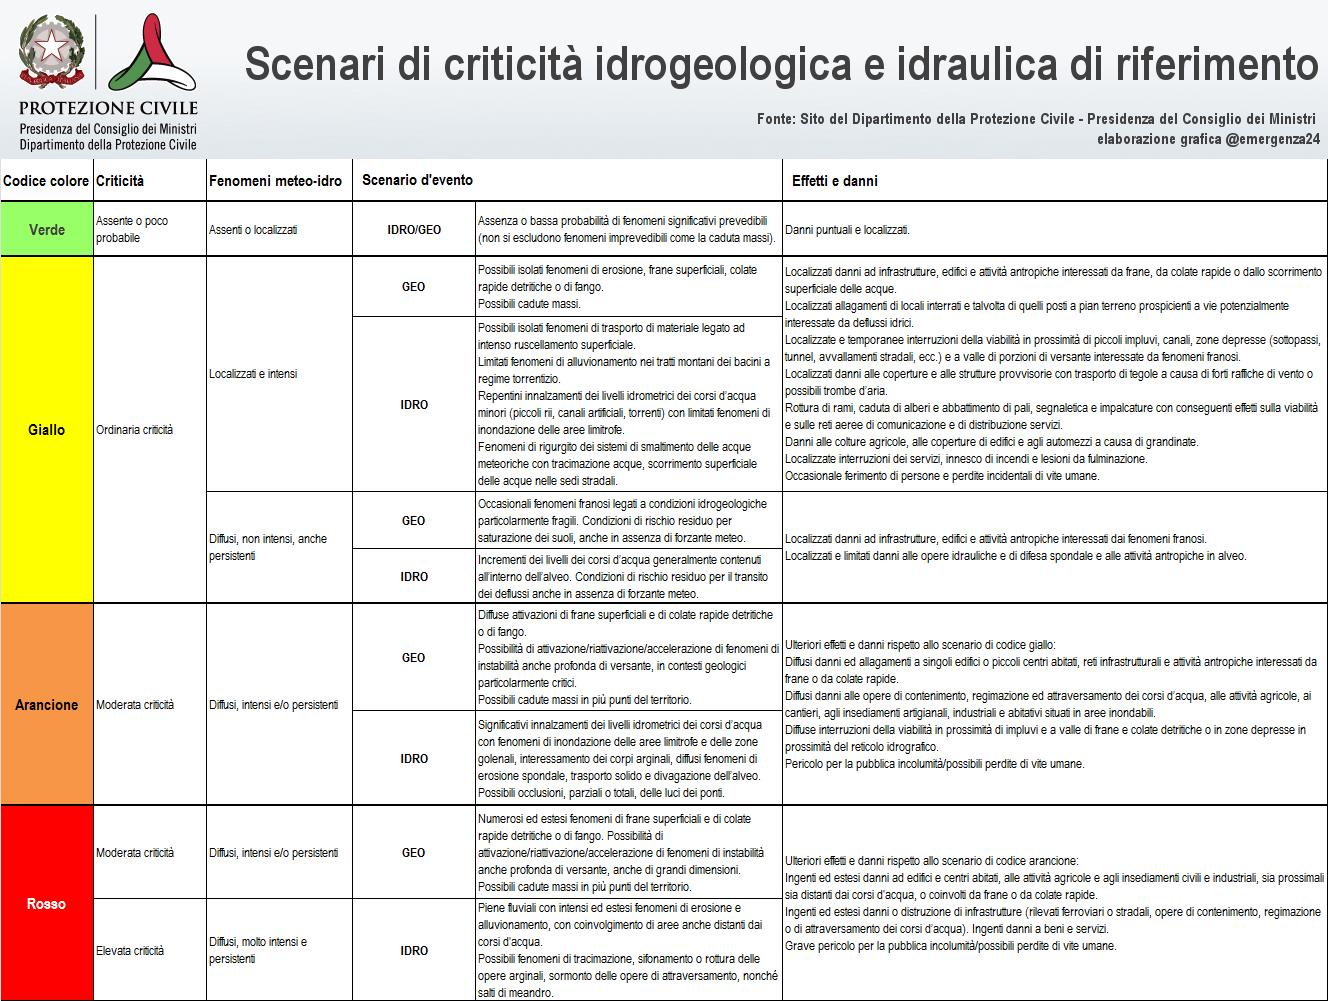 scenari_idrogeologia_pc_emergenza24